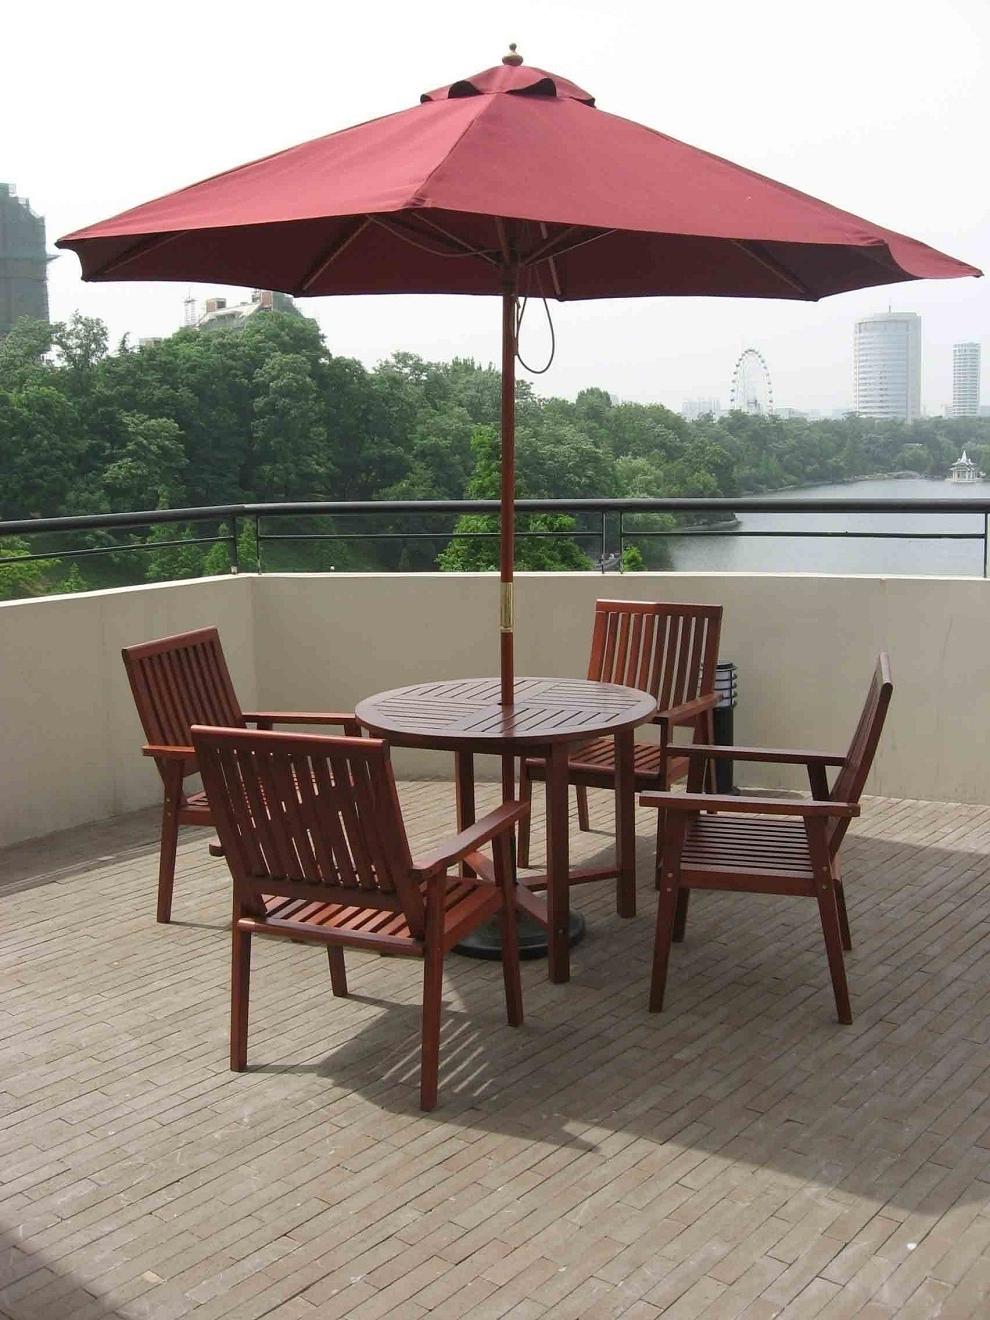 Latest Patio Furniture With Umbrellas Throughout Gorgeous Patio Table Umbrellas Patio Tables With Umbrella Ashery (View 7 of 20)